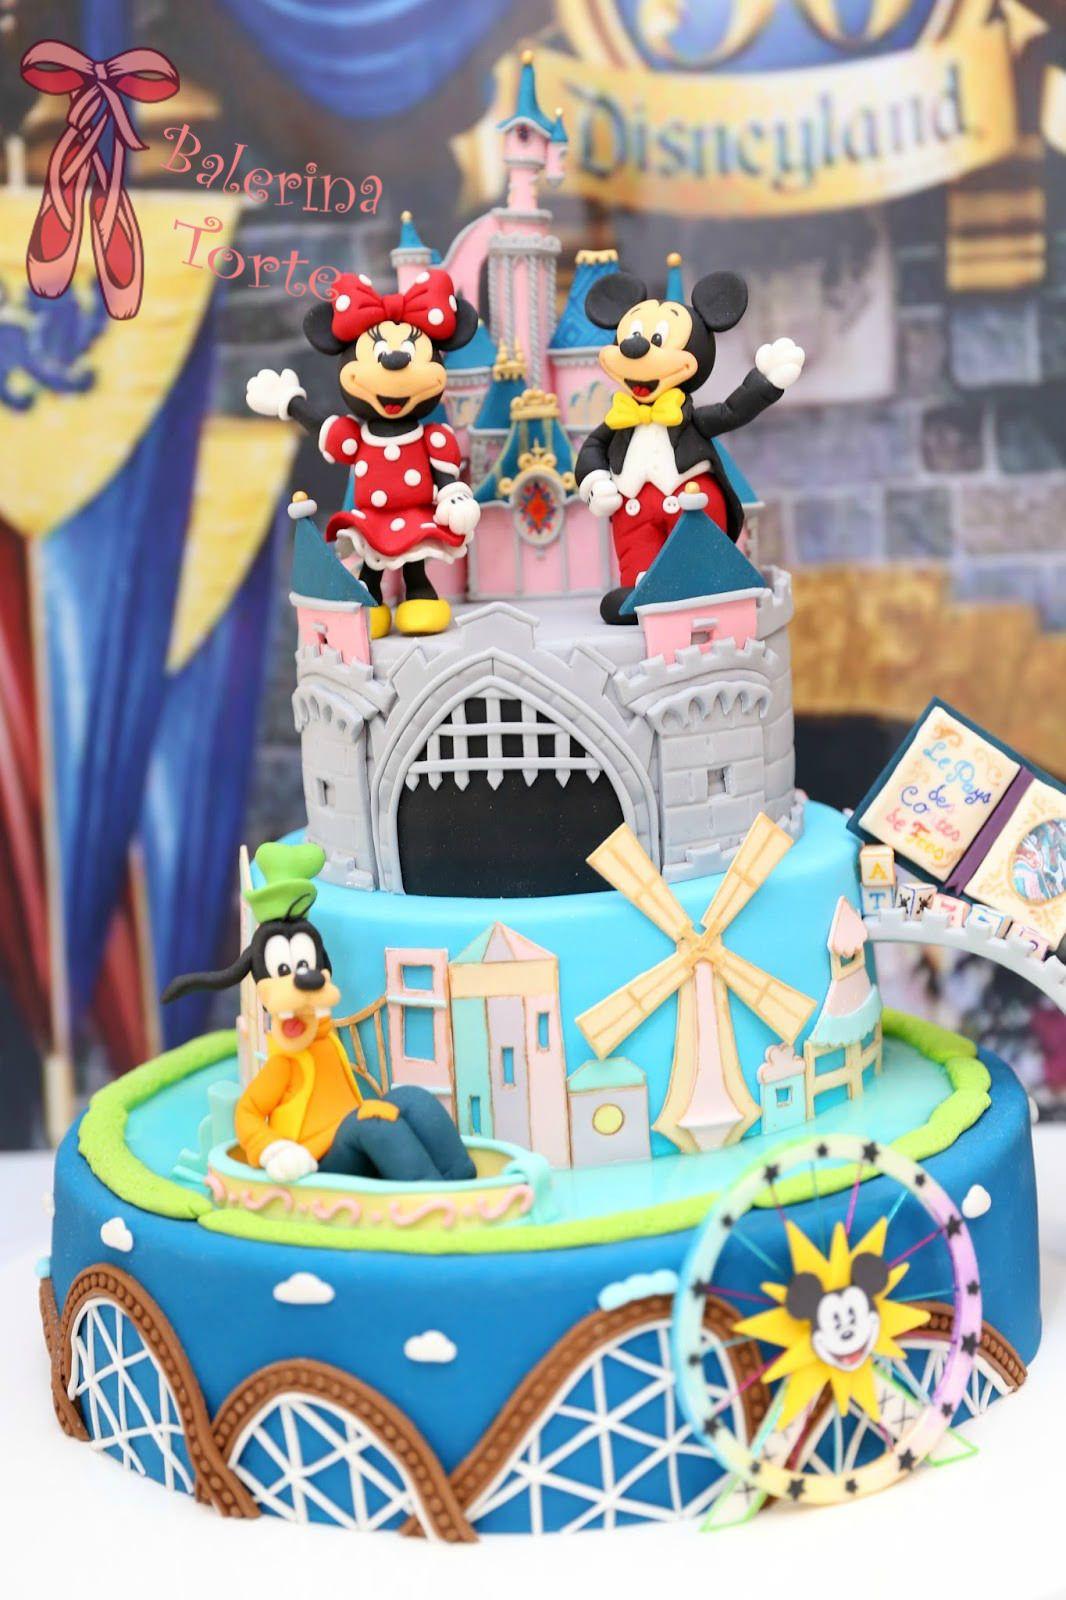 Best ideas about Disneyland Birthday Cake . Save or Pin Disneyland Cake – Diznilend torta by Balerina Torte Now.